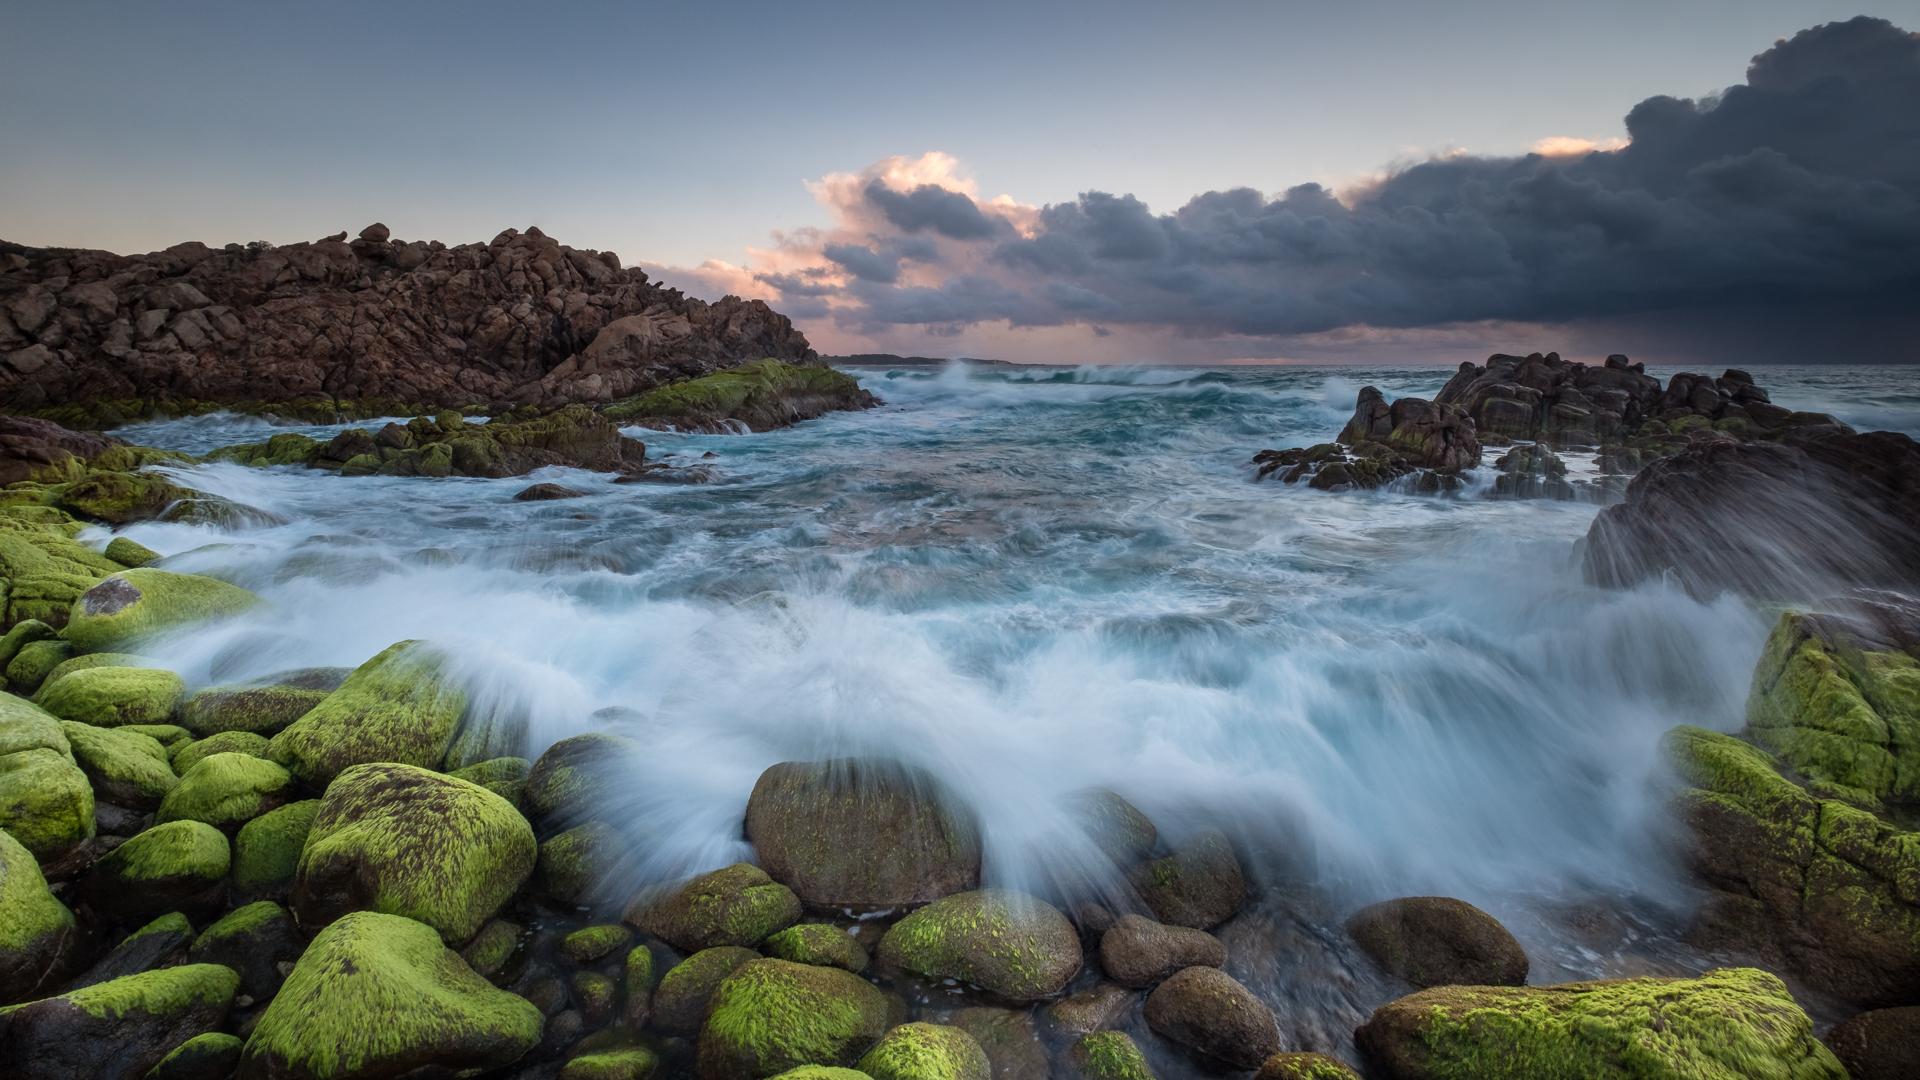 Wyadup Bay Green Rocks_1.jpg